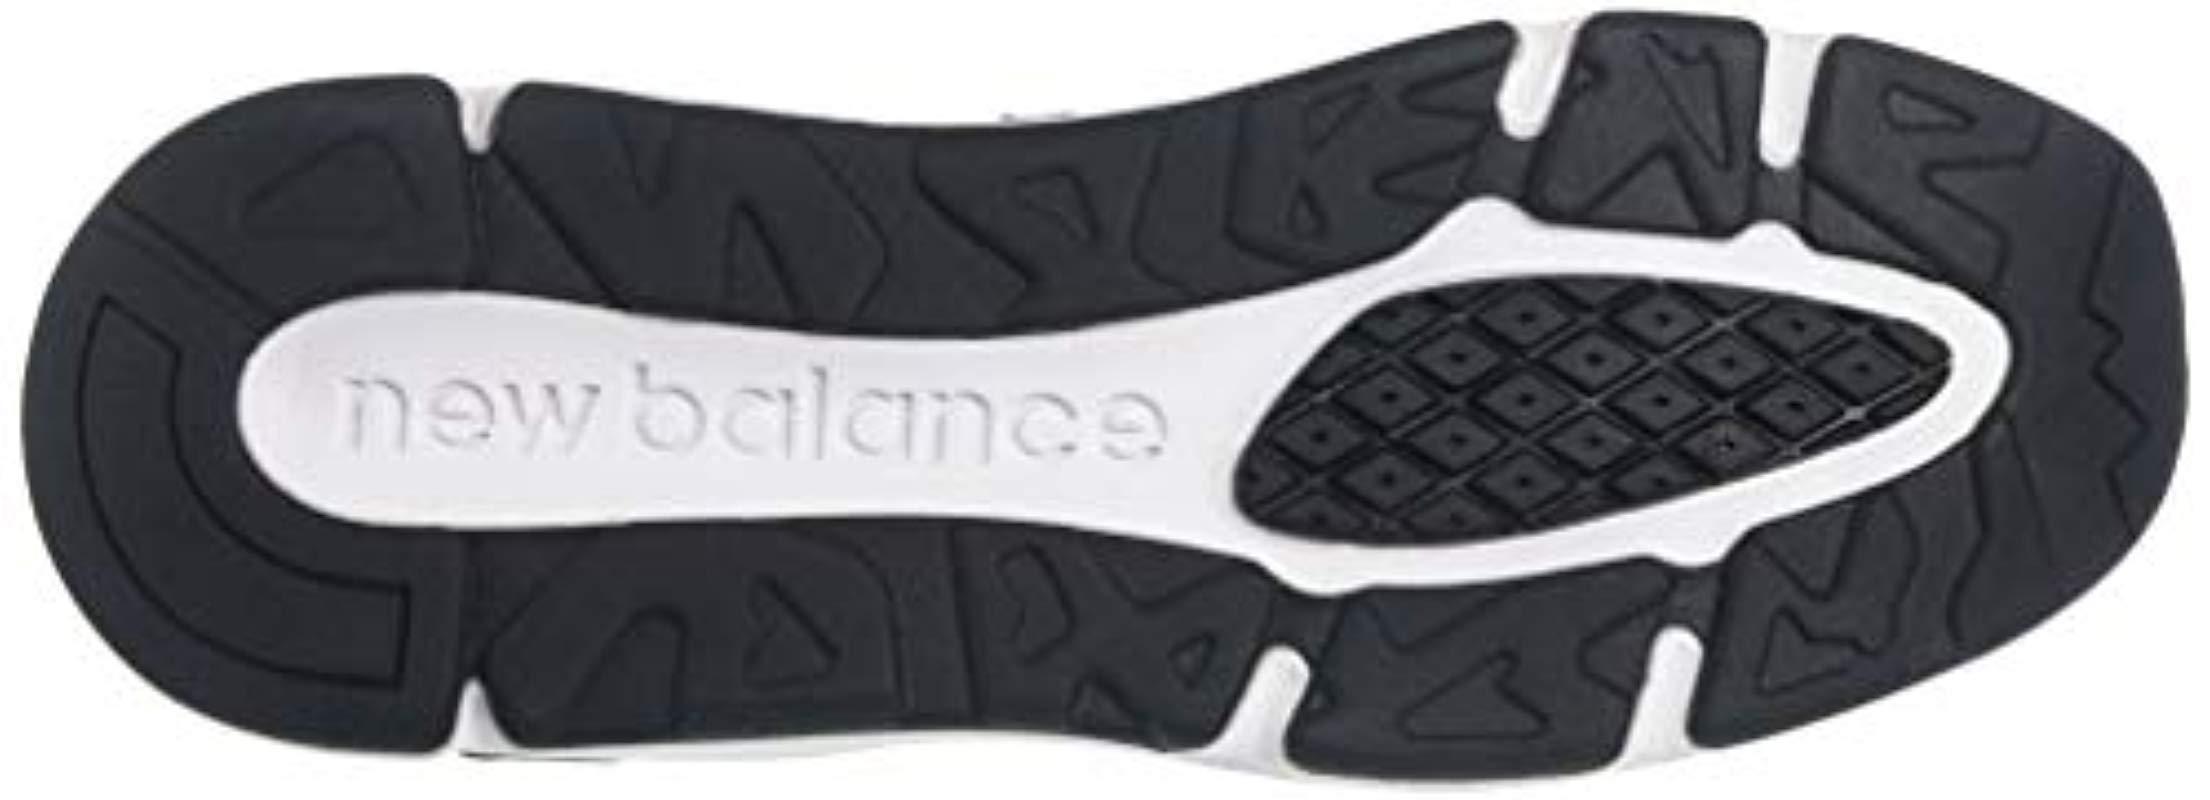 X 90, Zapatillas para Hombre New Balance de hombre de color Blue